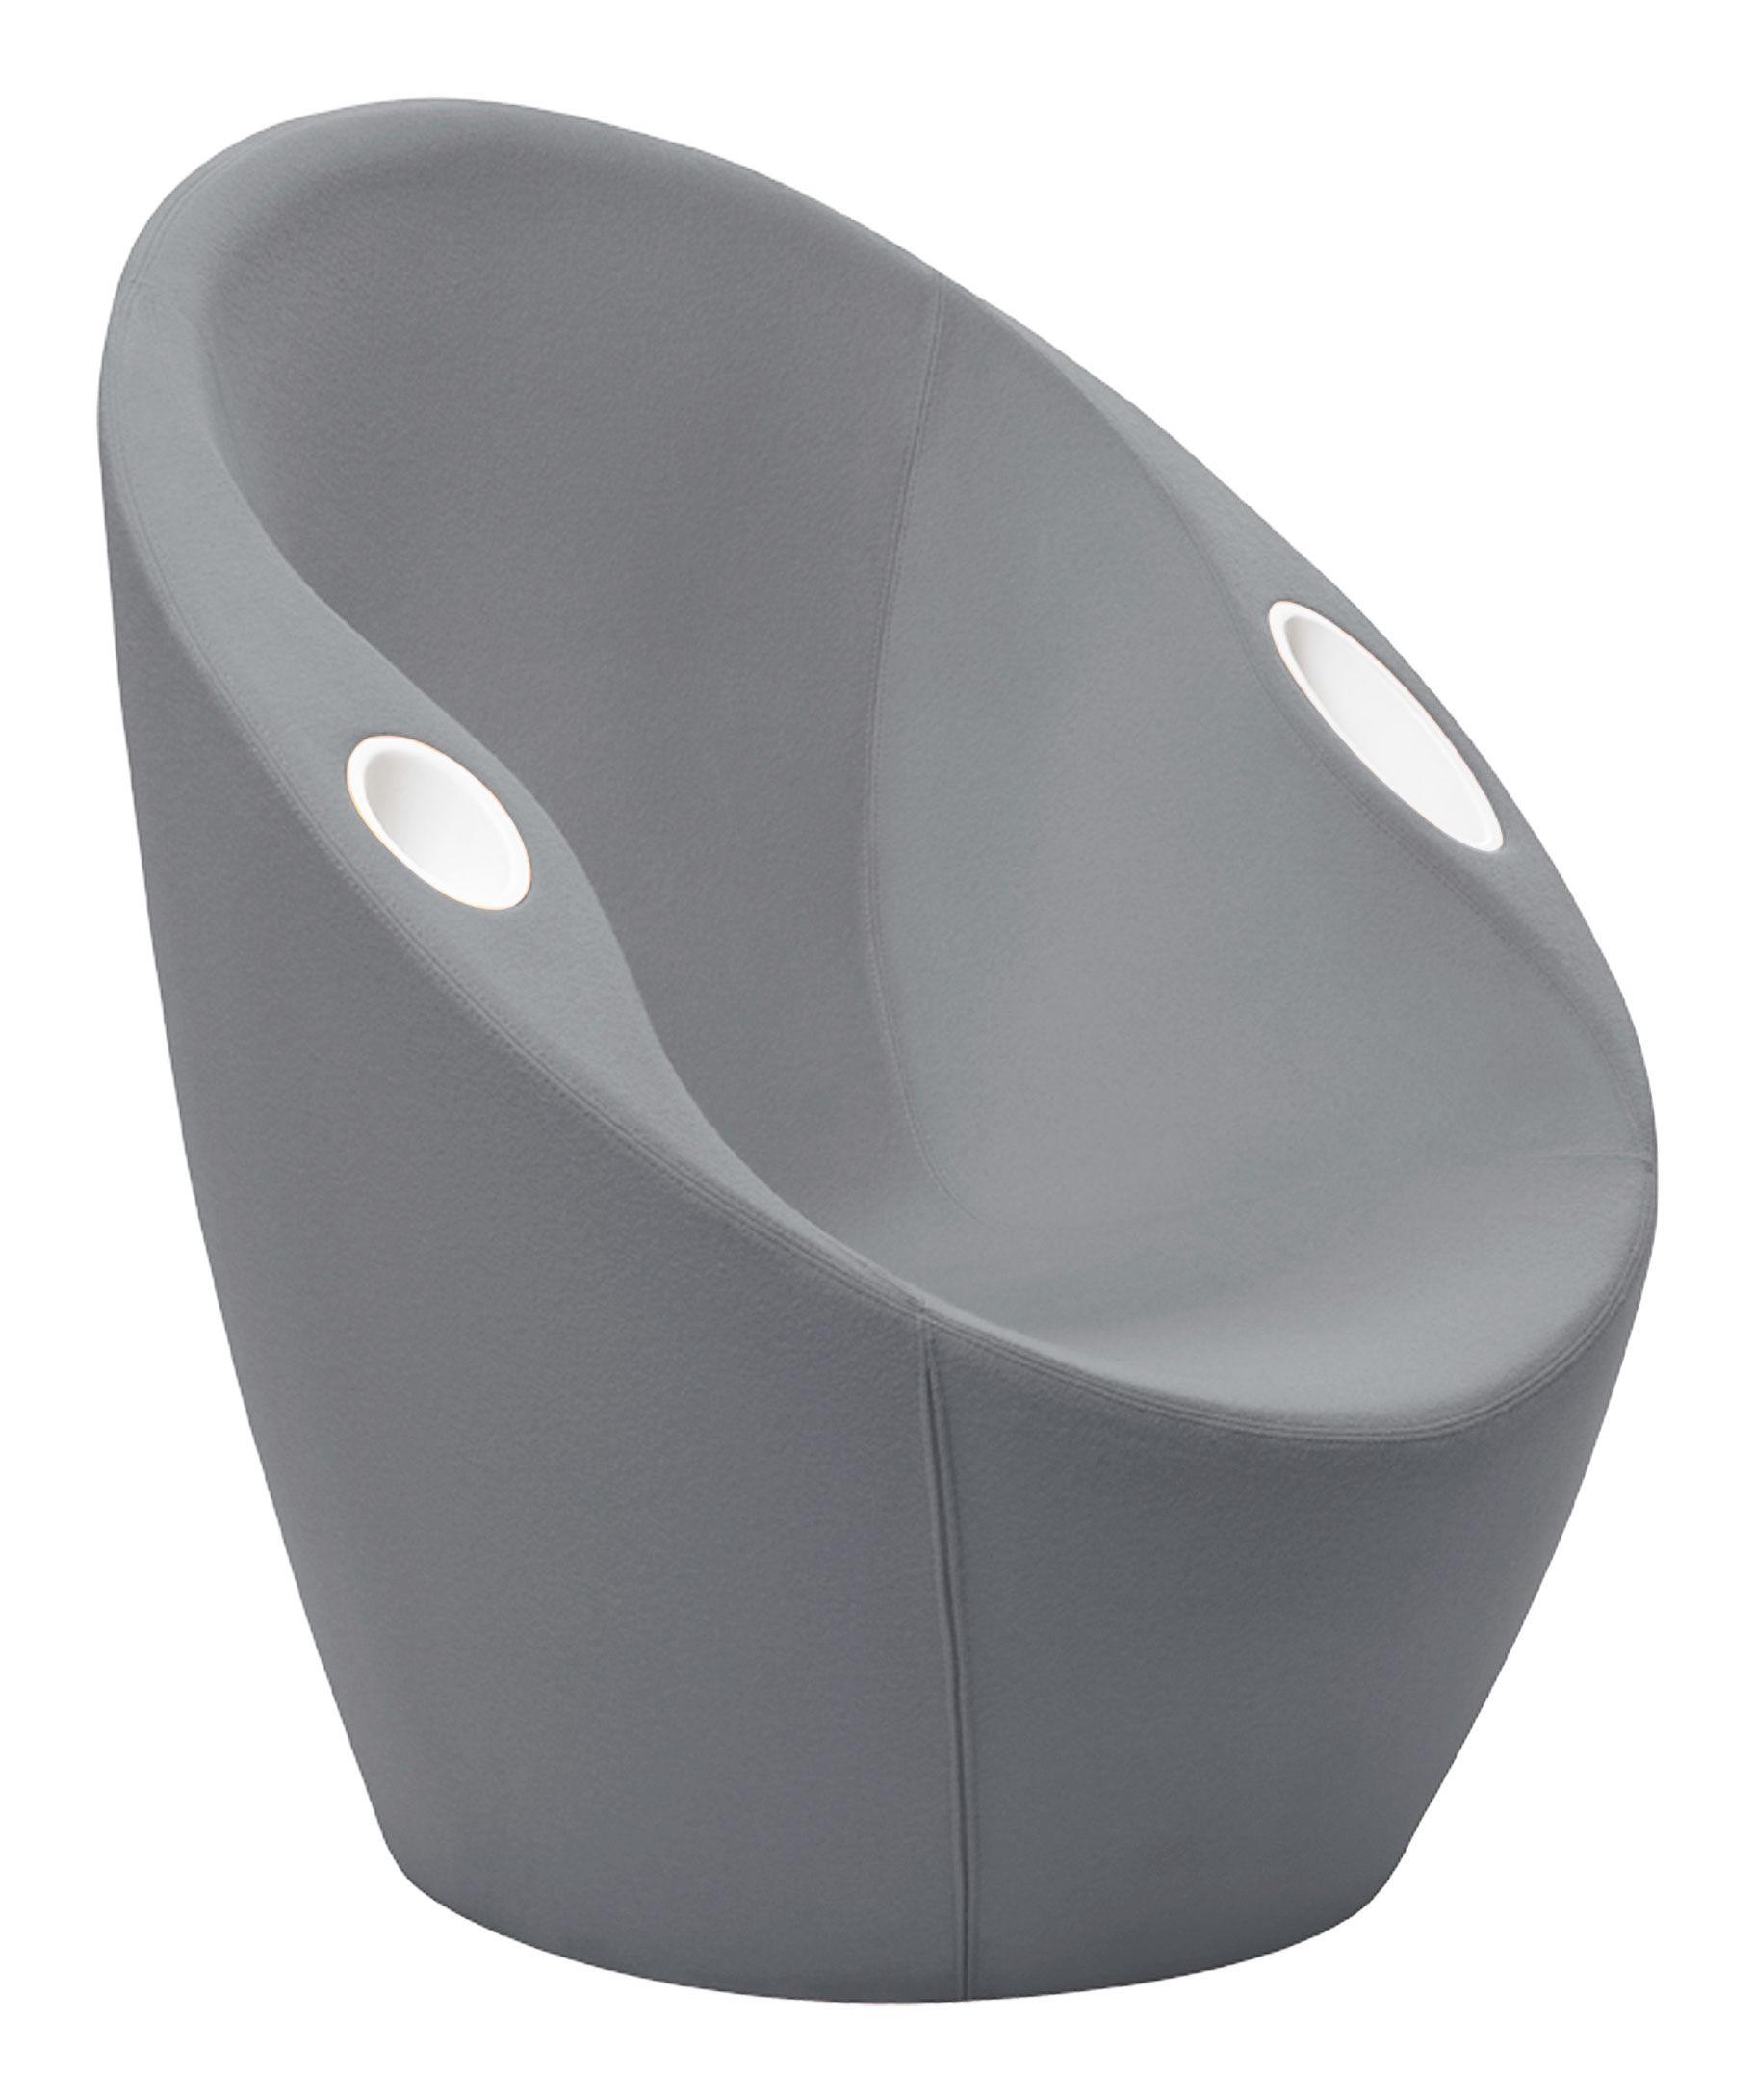 Möbel - Lounge Sessel - Ouch Gepolsterter Sessel mit Armlehnen - Bezug aus Stoff - Casamania - Grau - Gewebe, Metall, Schaumstoff